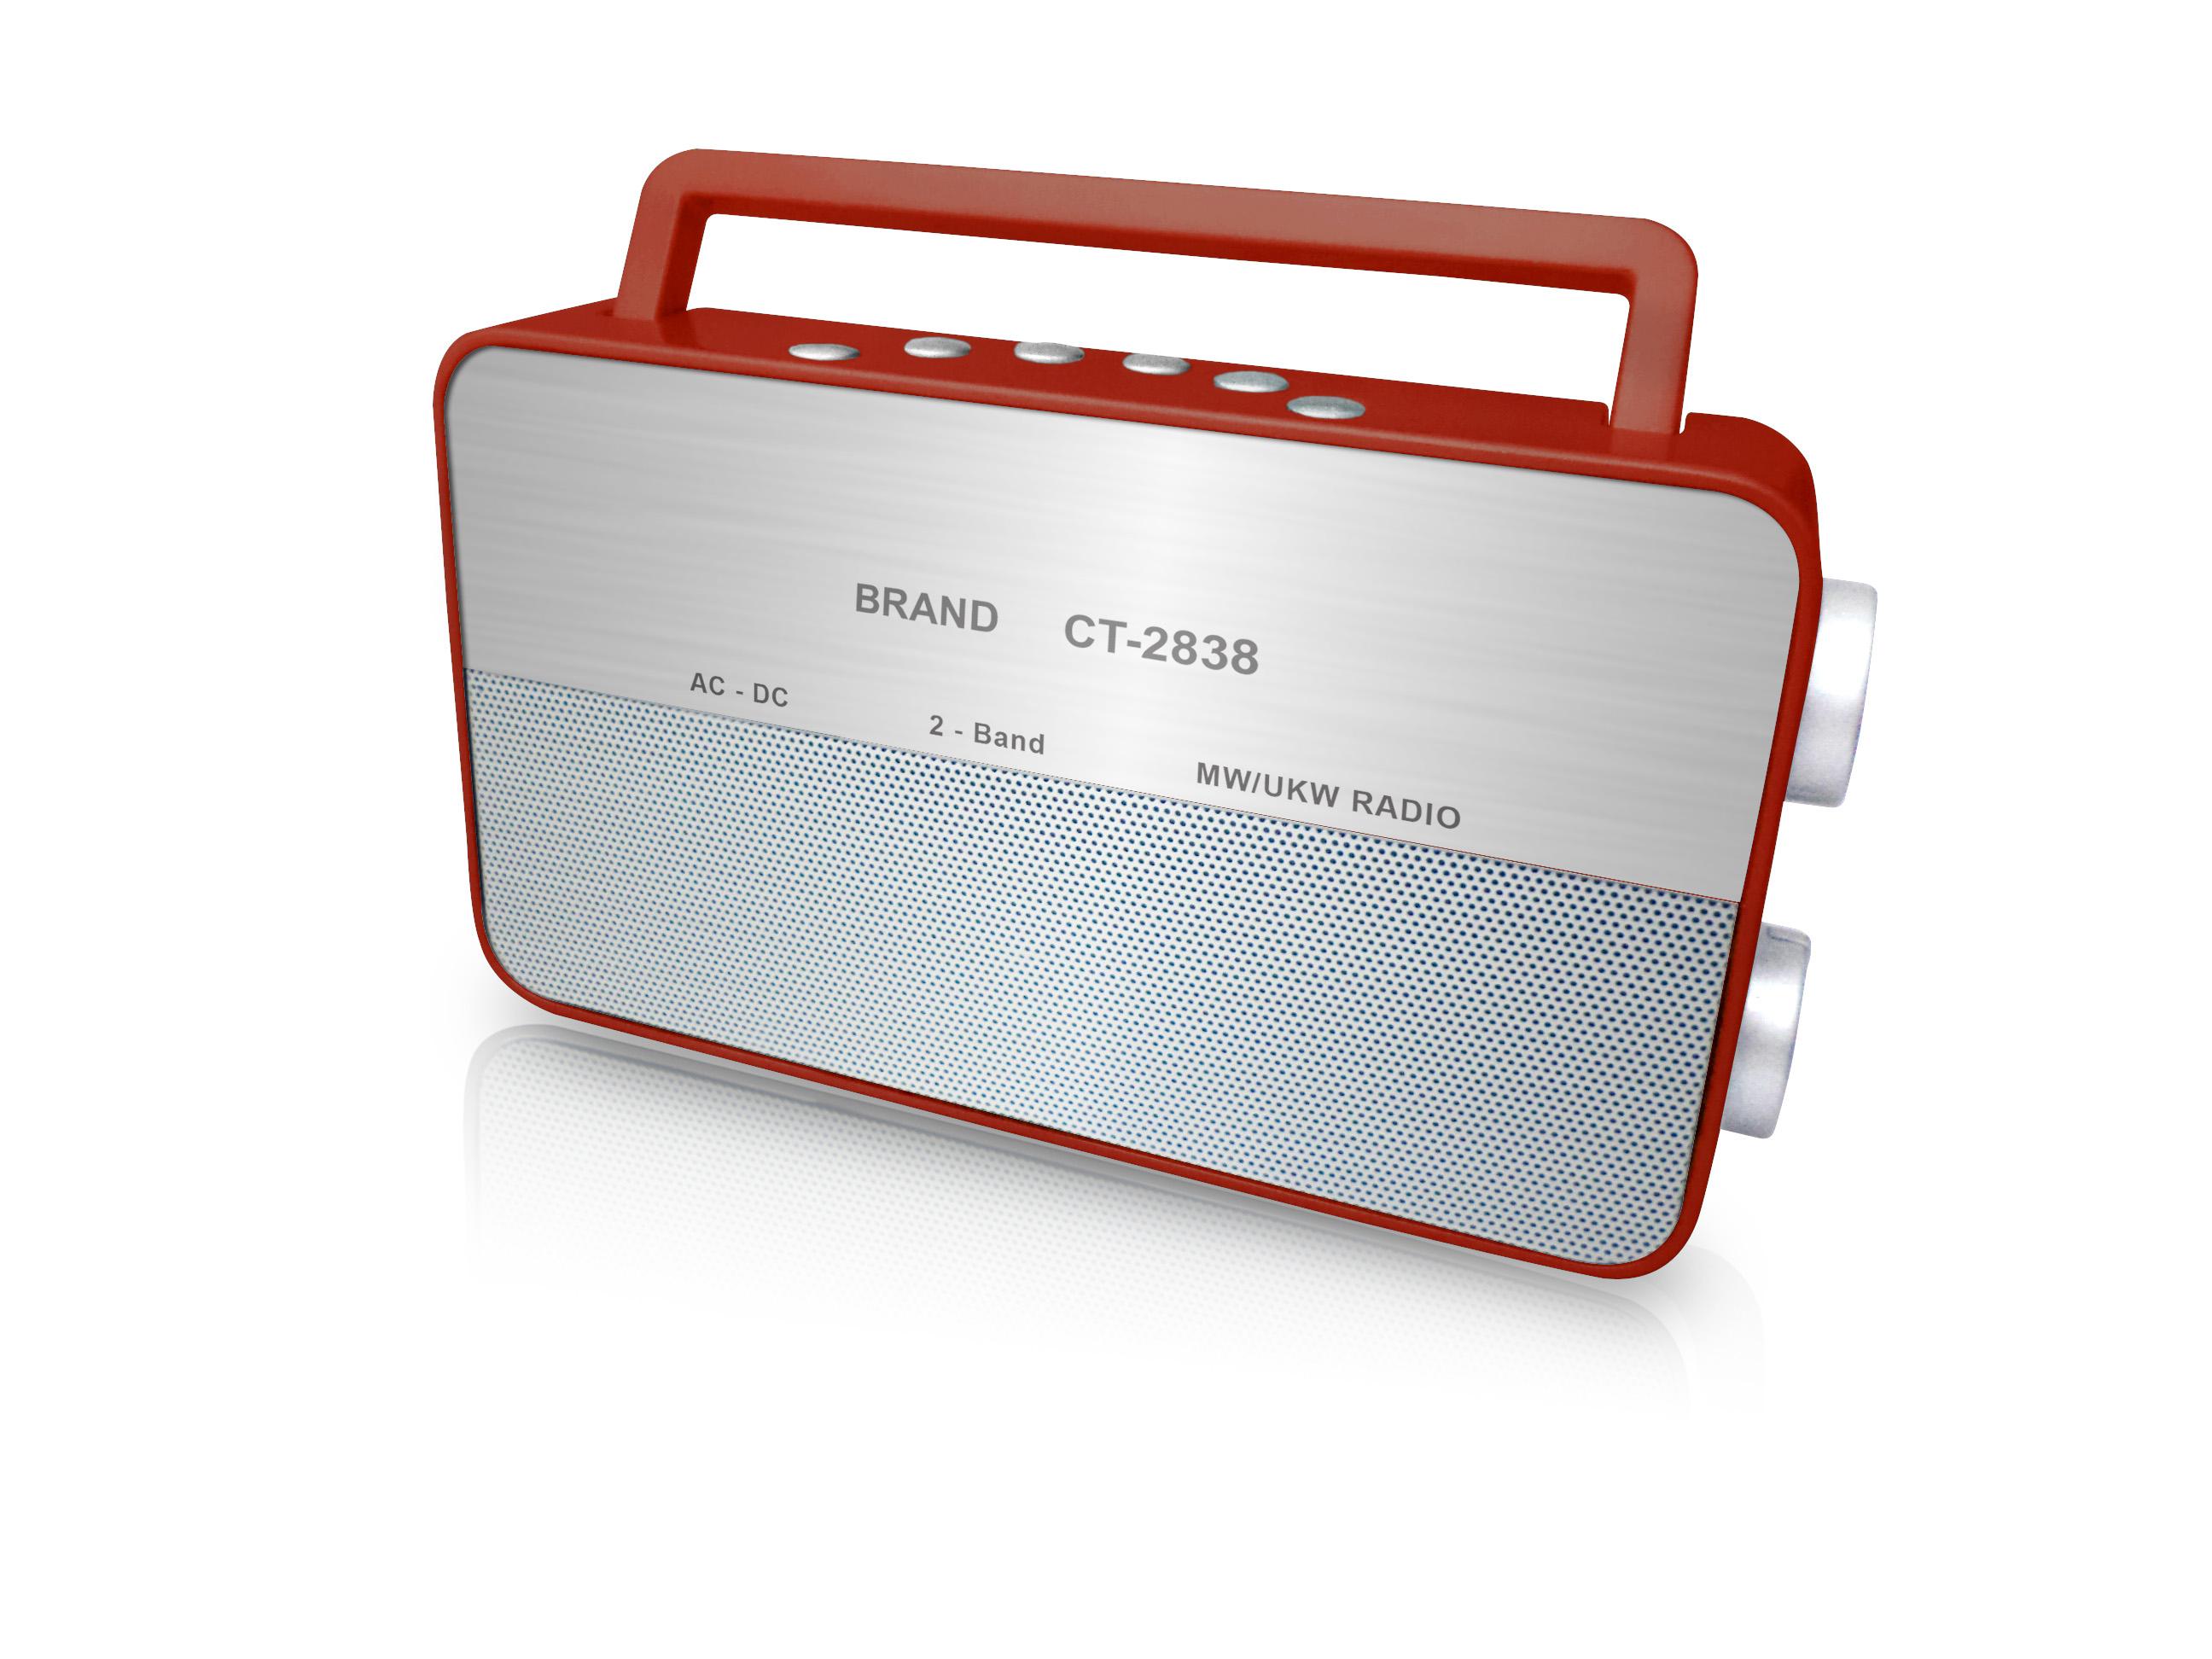 CT-2838 Brand R.jpg